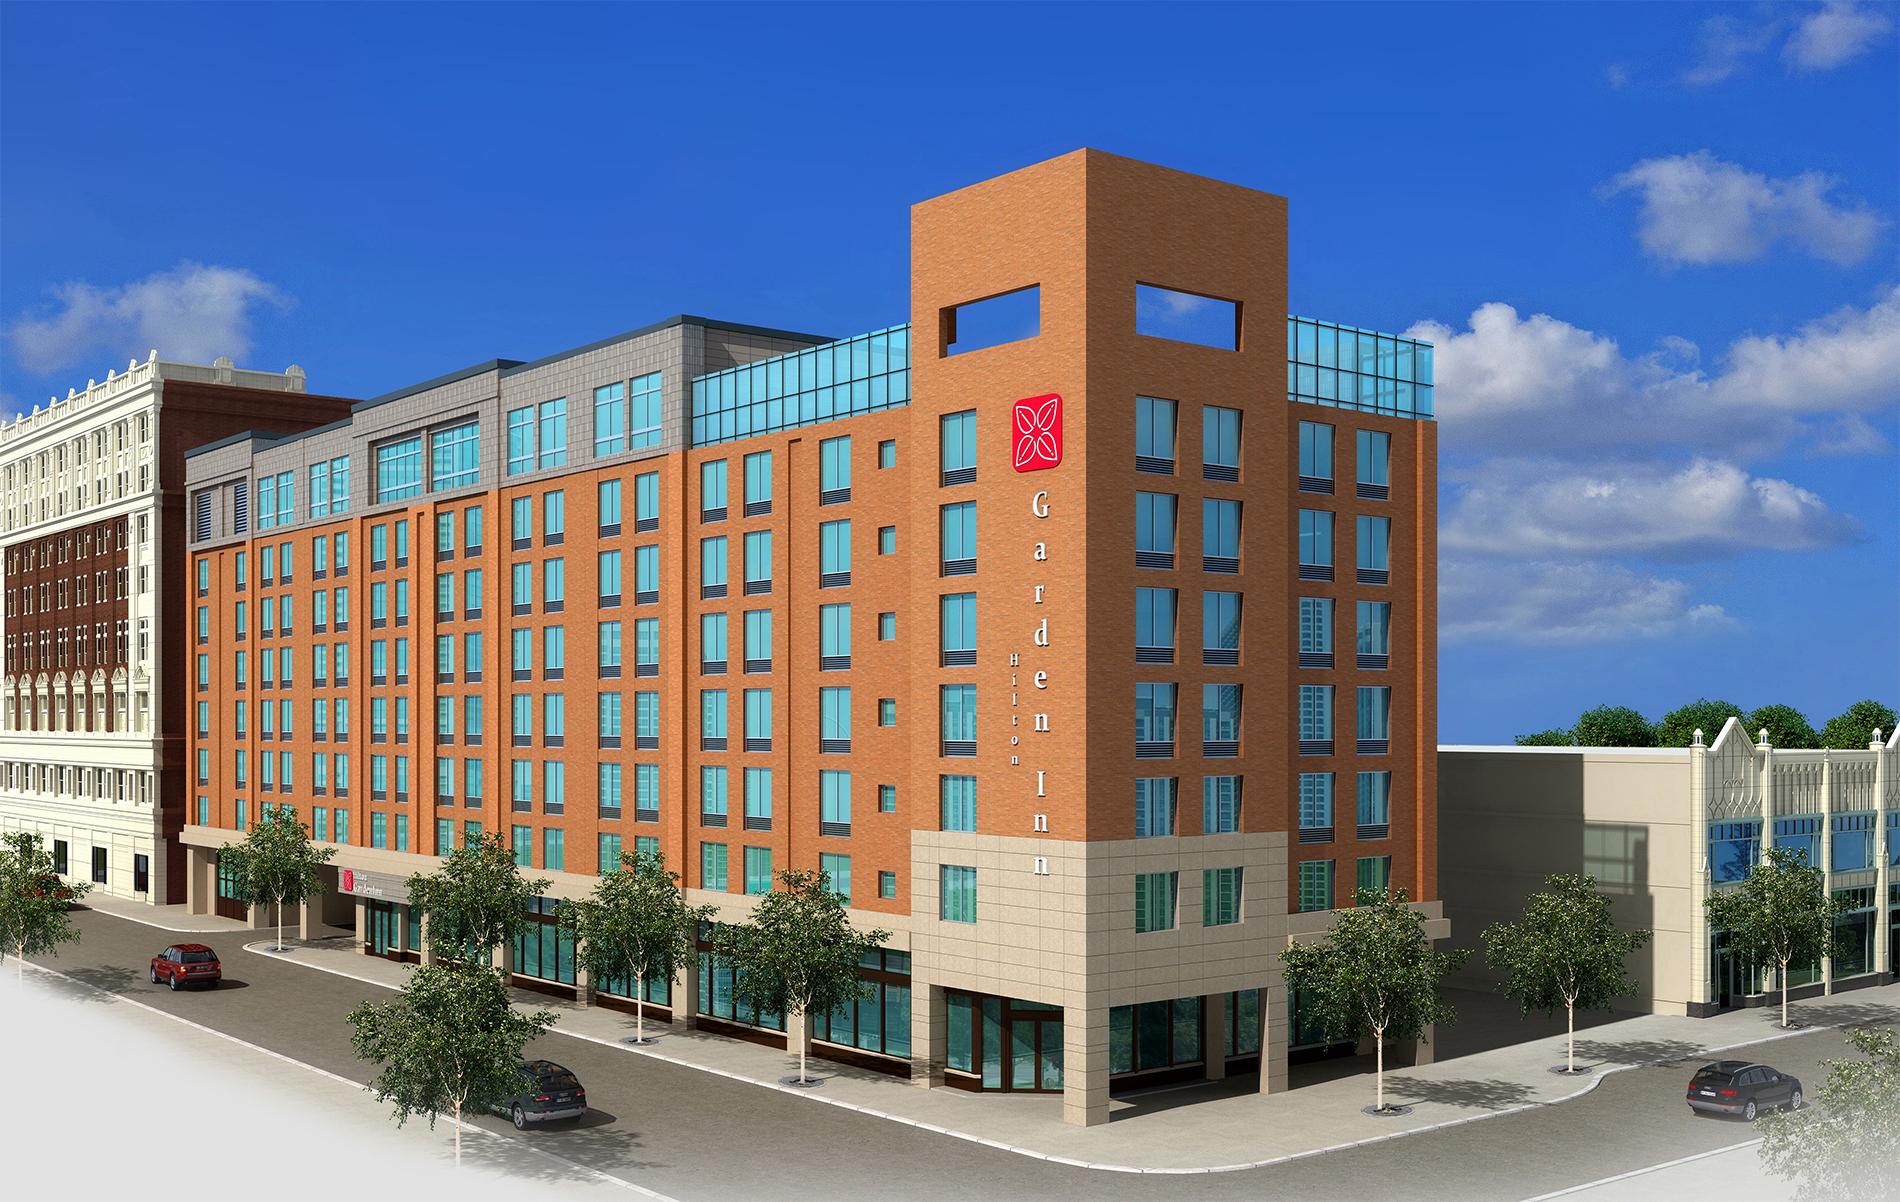 hilton garden inn welcomes its newest hotel in the heart of downtown louisville - Hilton Garden Inn Nashville Downtown